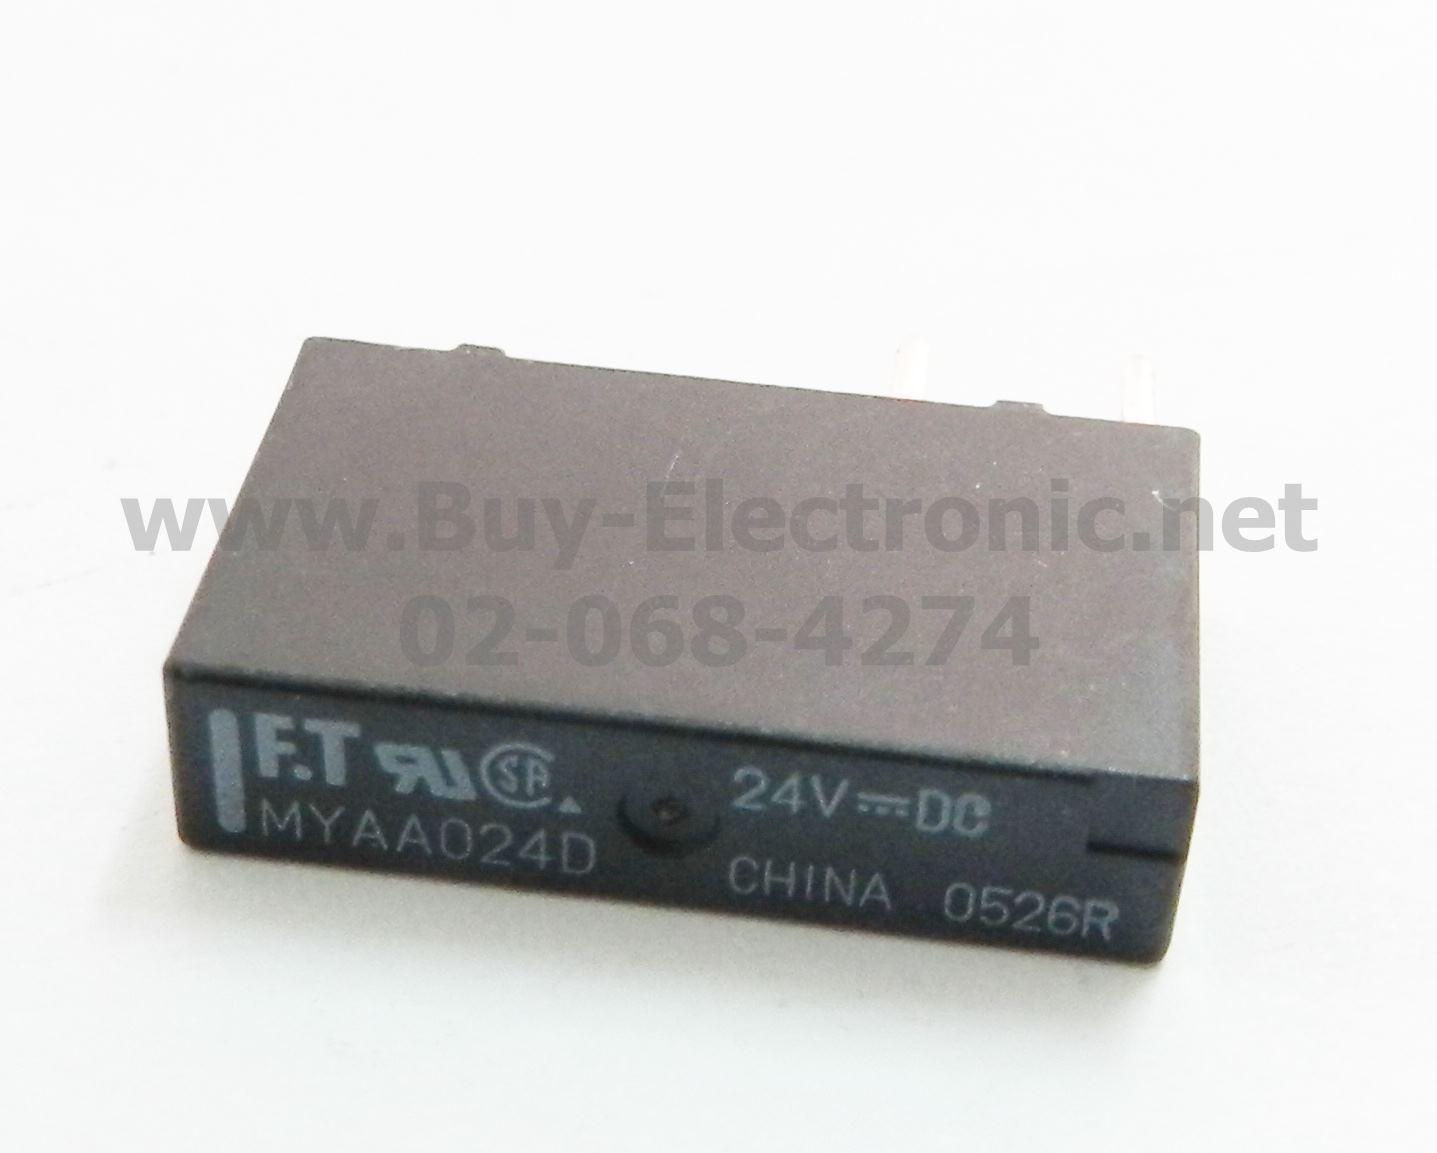 FTR-MYAA024D Fujitsu - สินค้าใหม่ ได้ของชัวร์